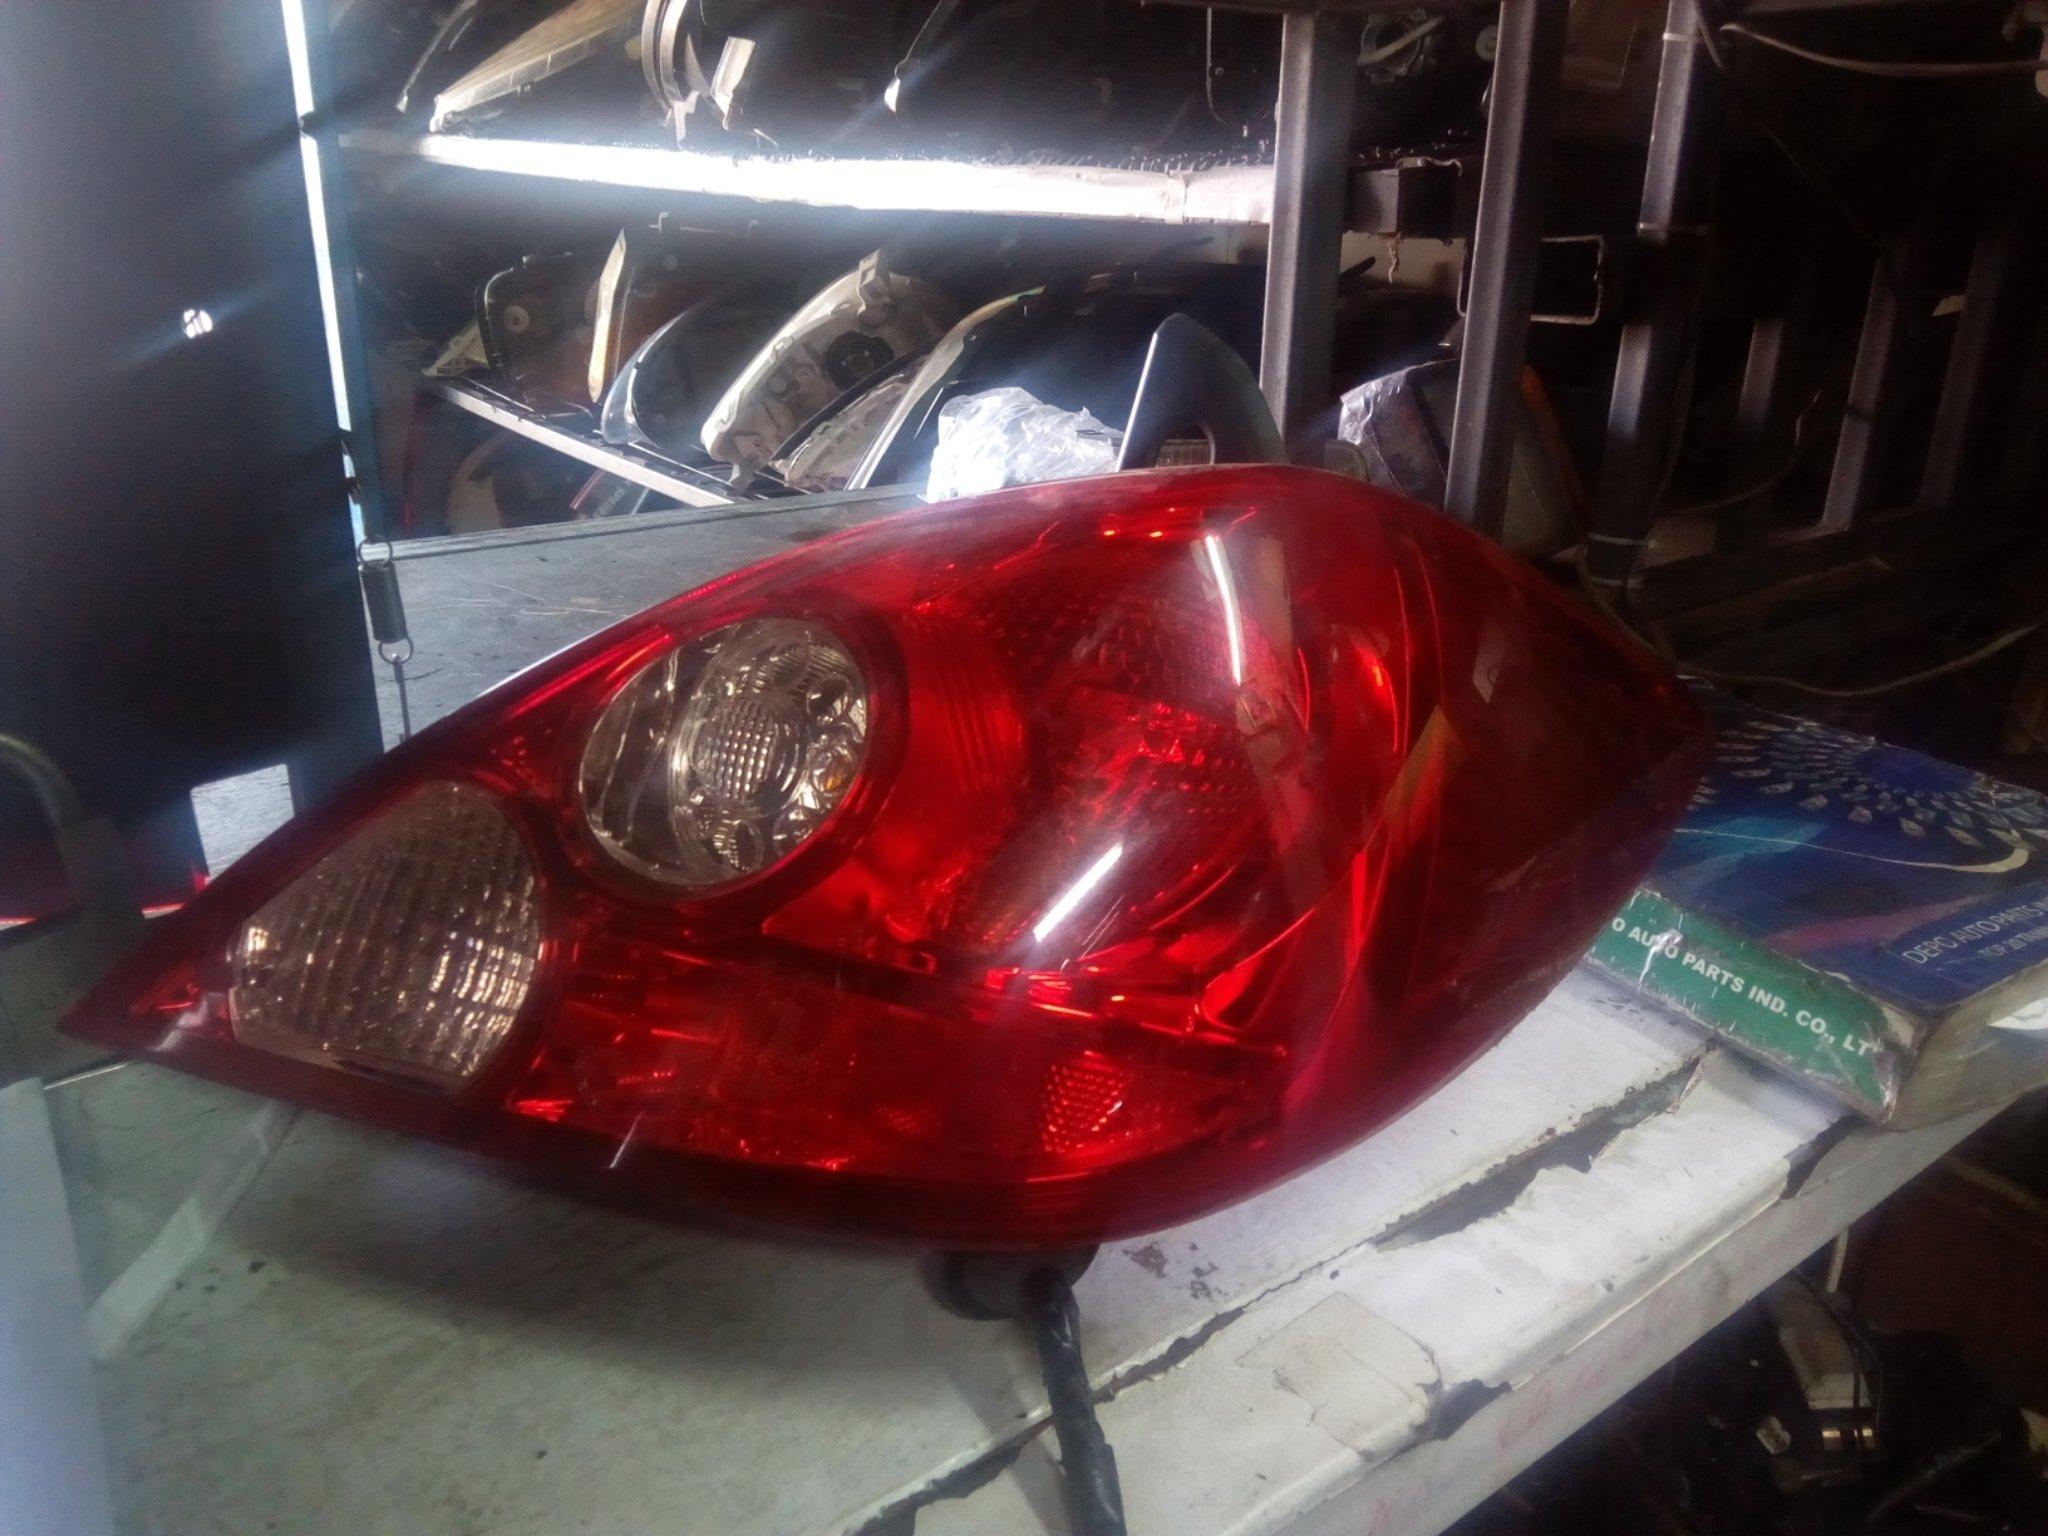 Nissan Tiida tail light 00302